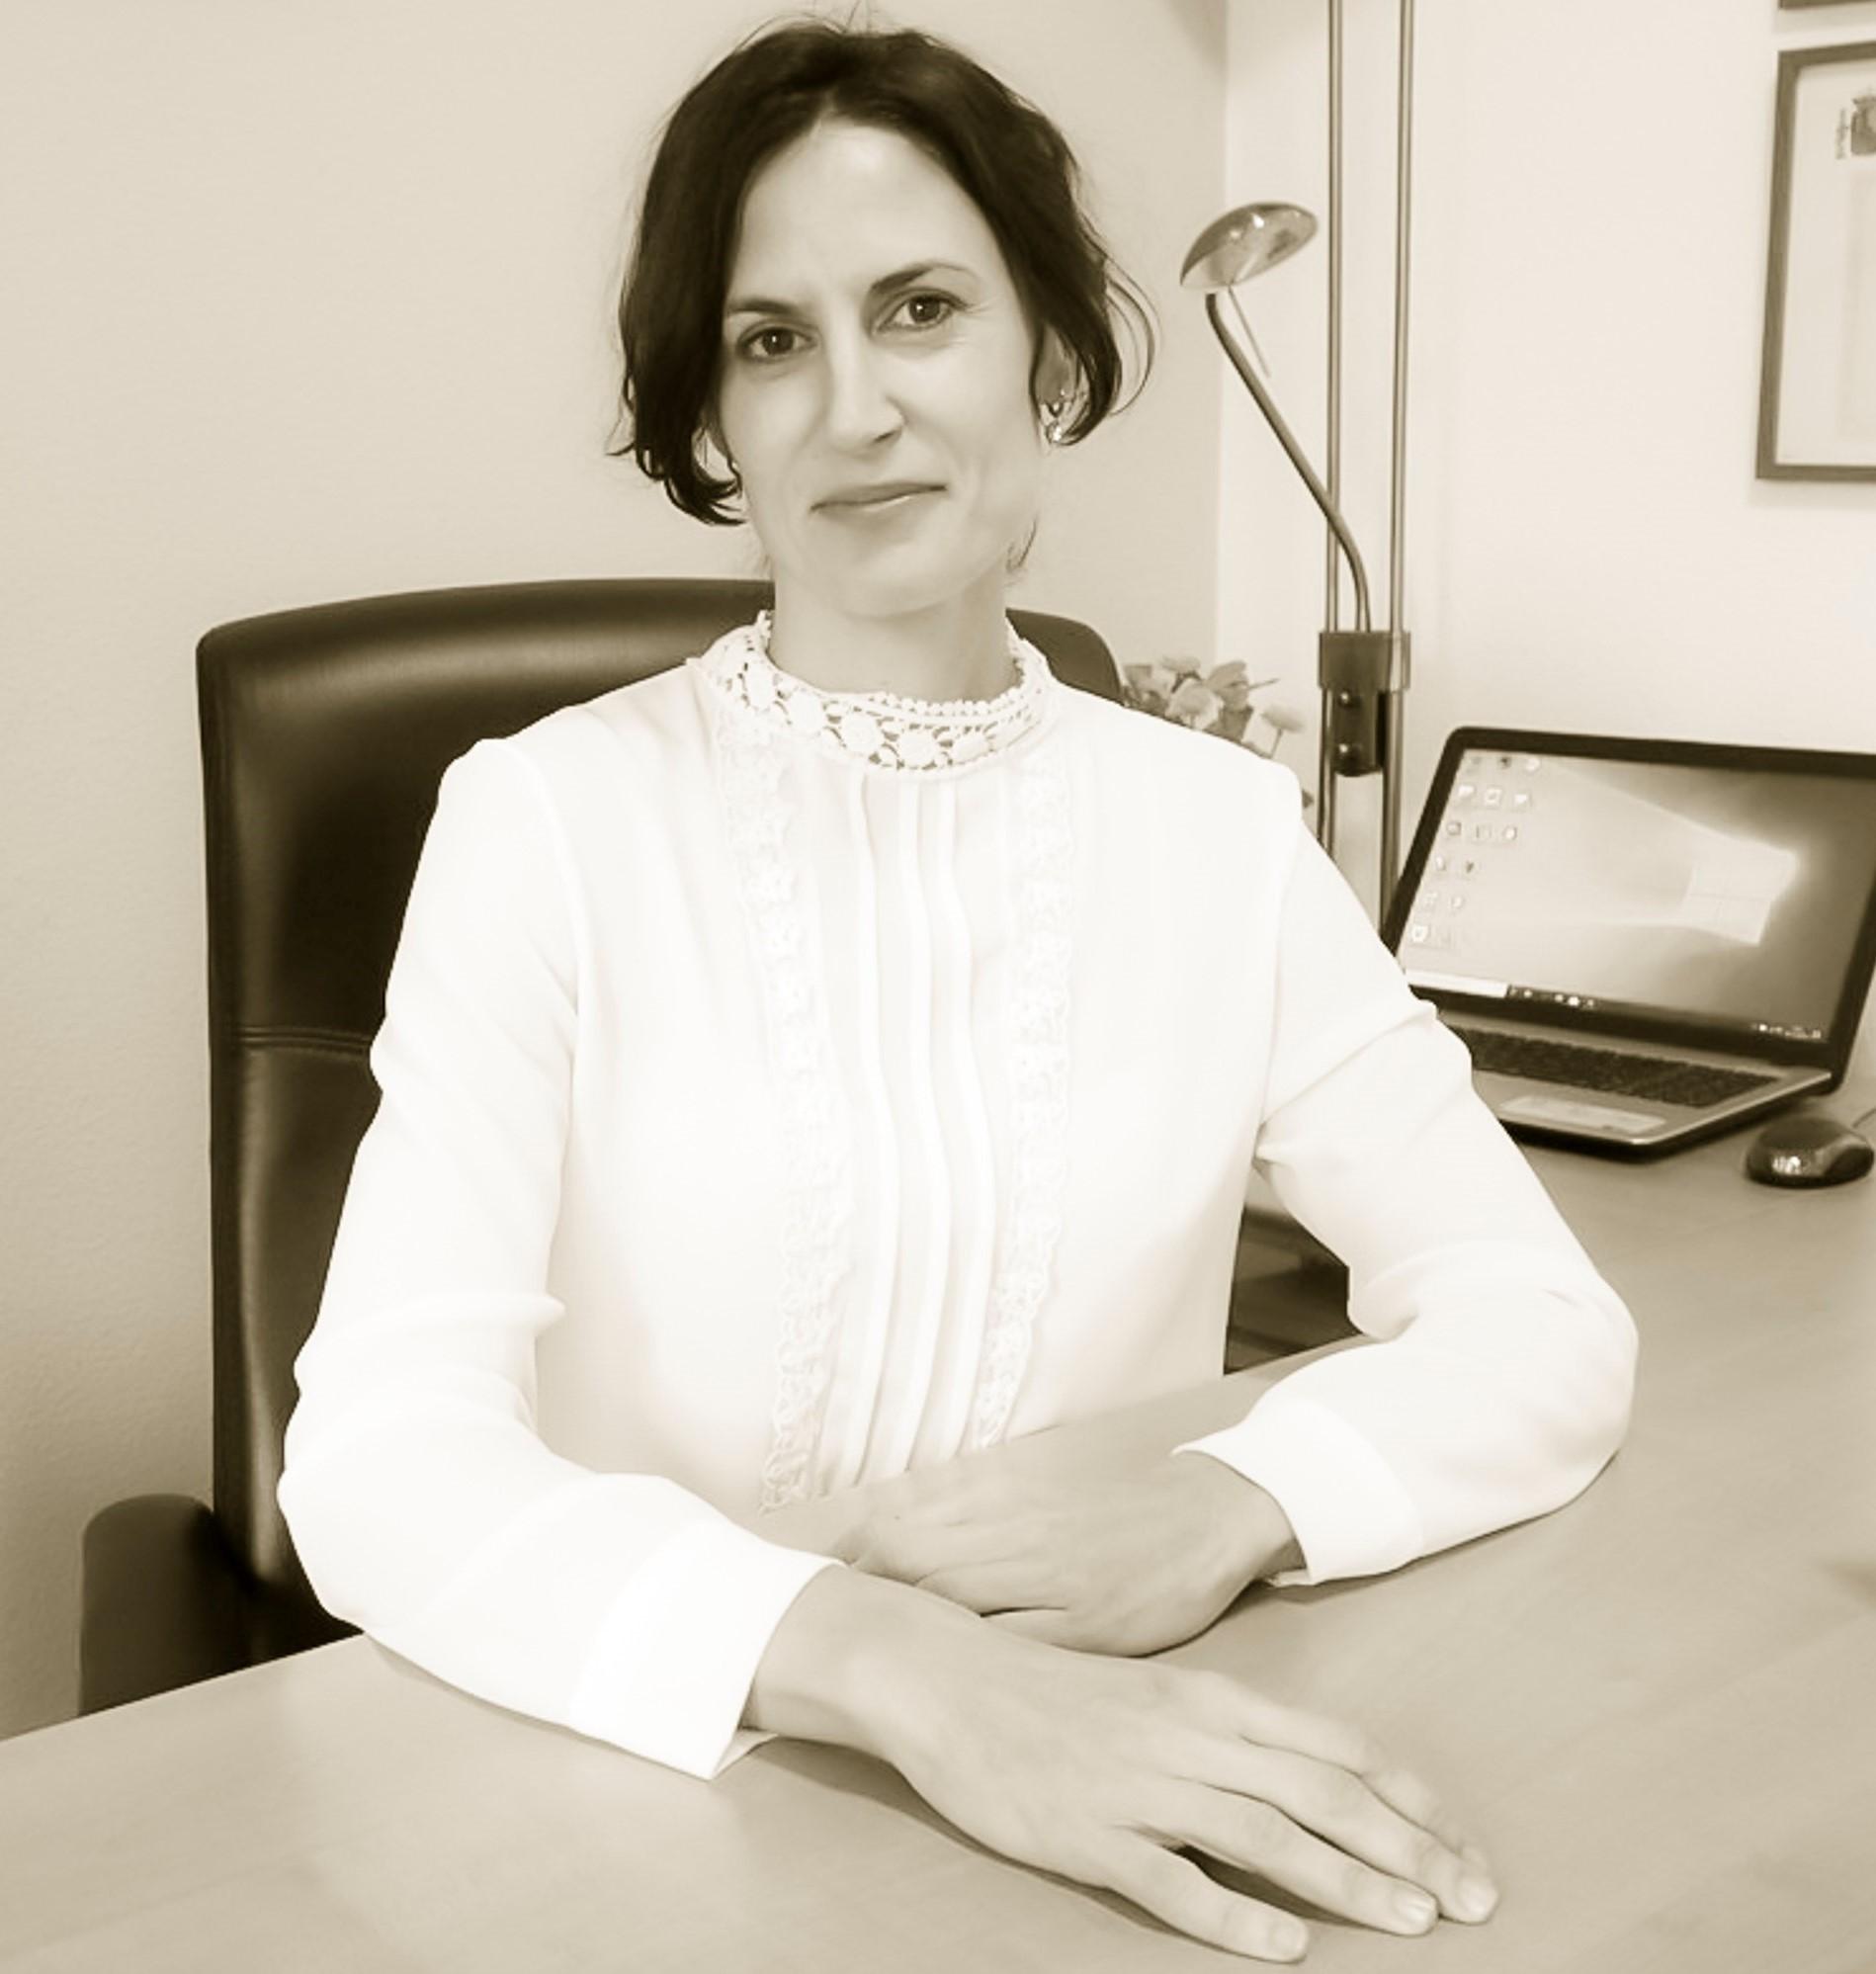 Consulta Psicológica Móstoles - Psicólogo Móstoles - Terapia Psicológica Móstoles